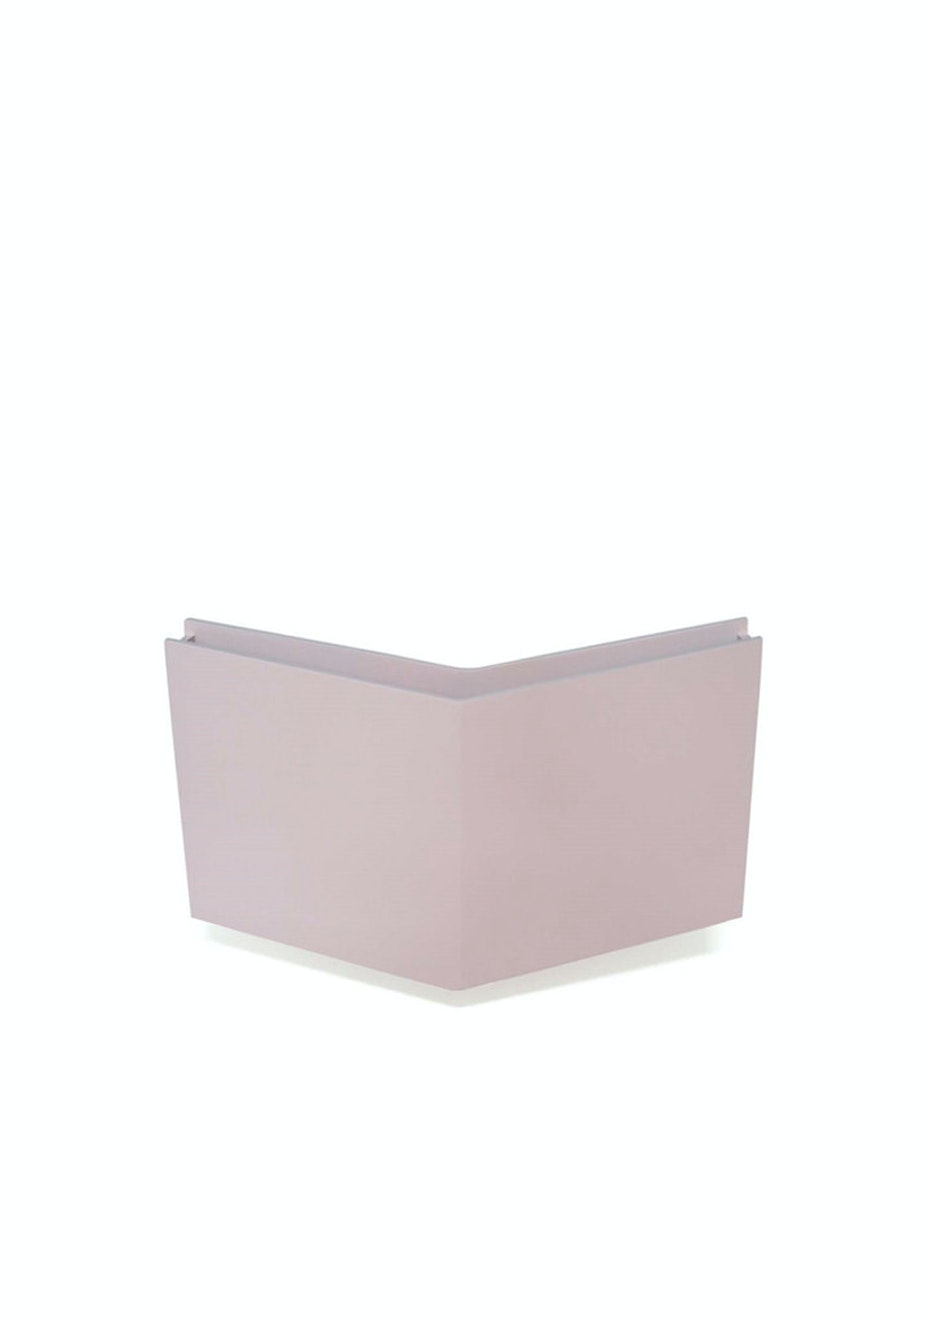 Me & My Trend - Medium Pink Book Wall Pocket